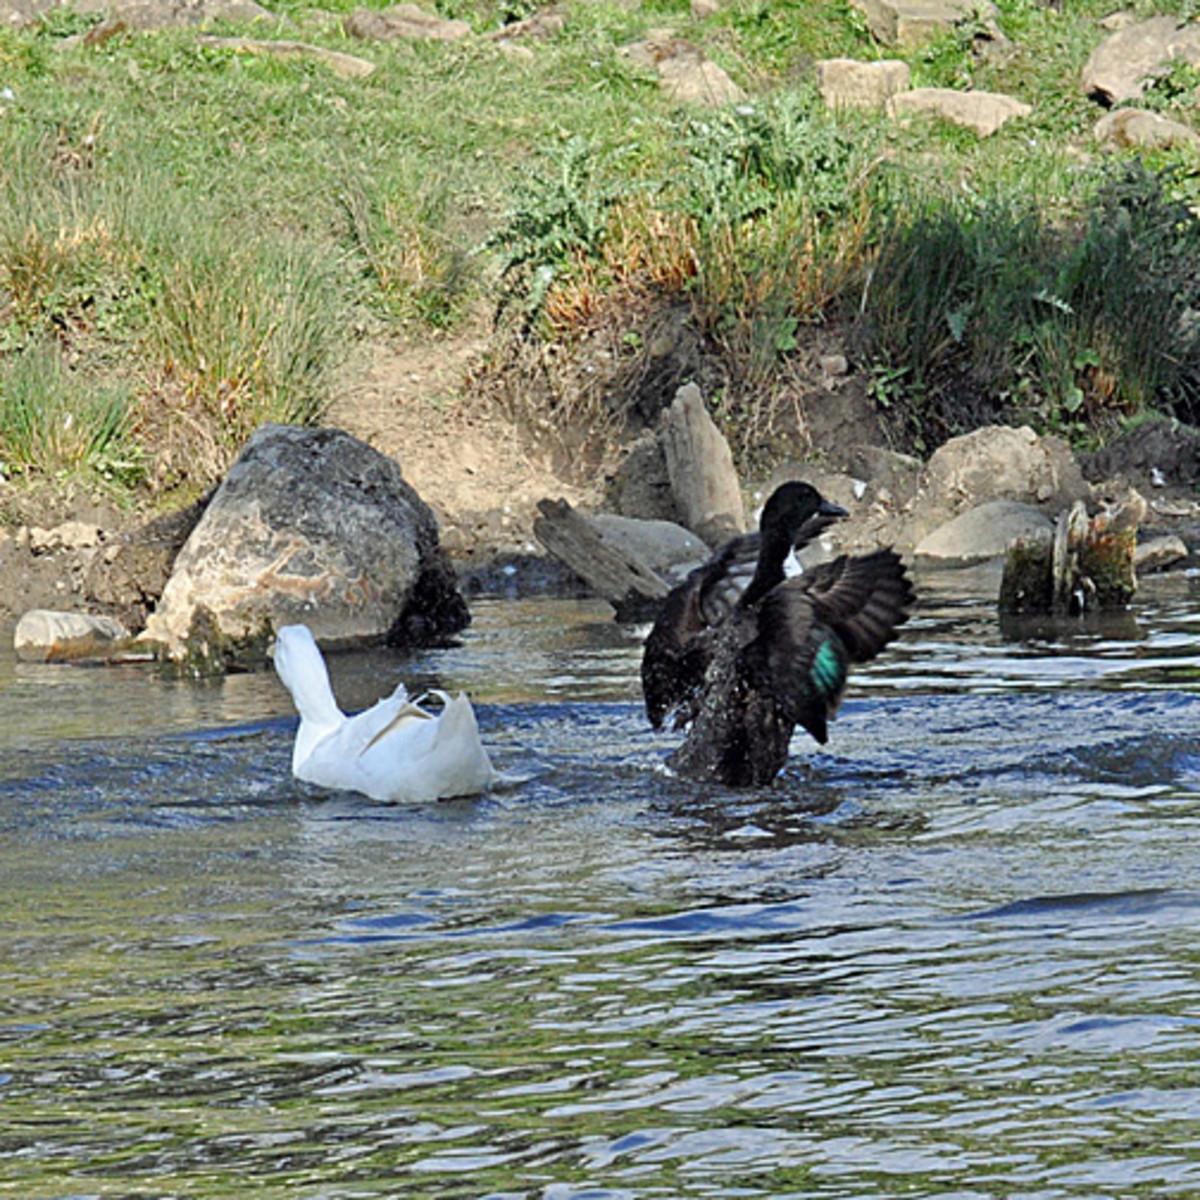 Blue Swedish ducks